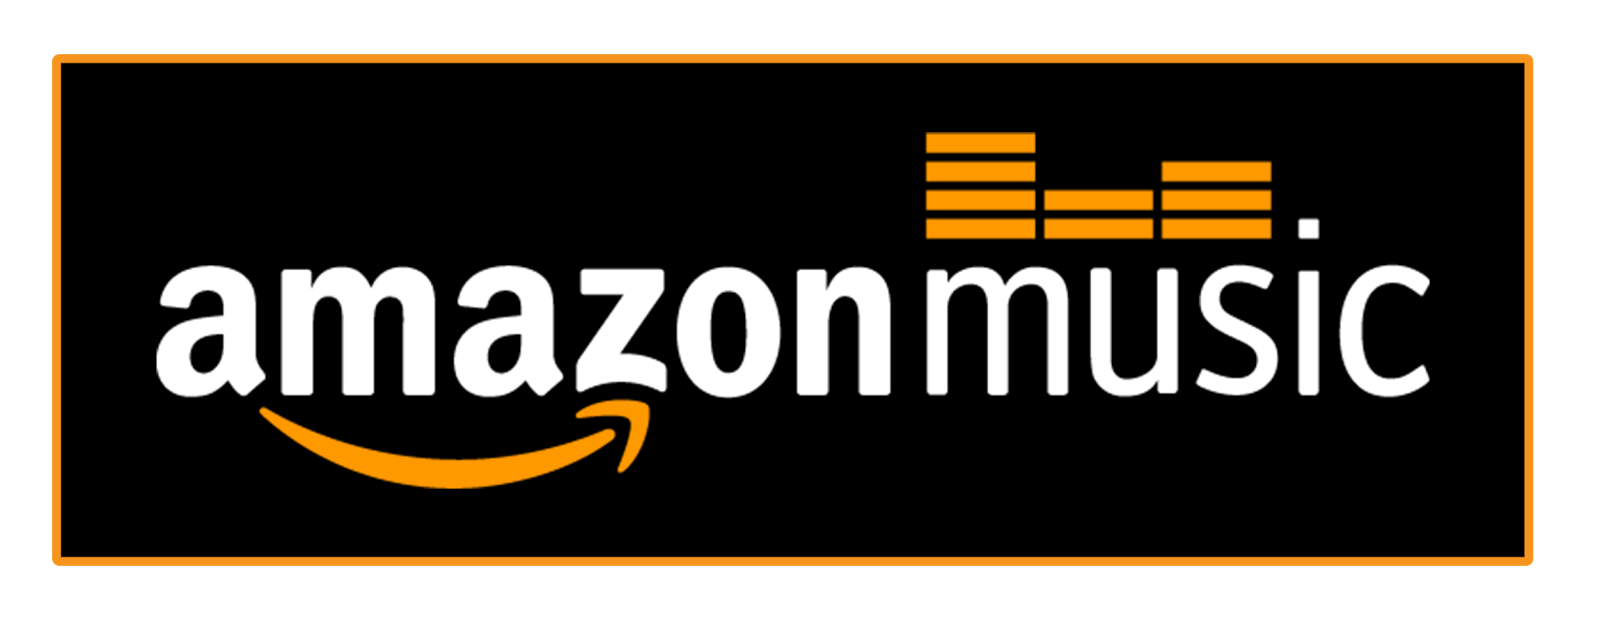 Image result for amazon music logo | Music logo, Logos ... - Amazon TV Logo